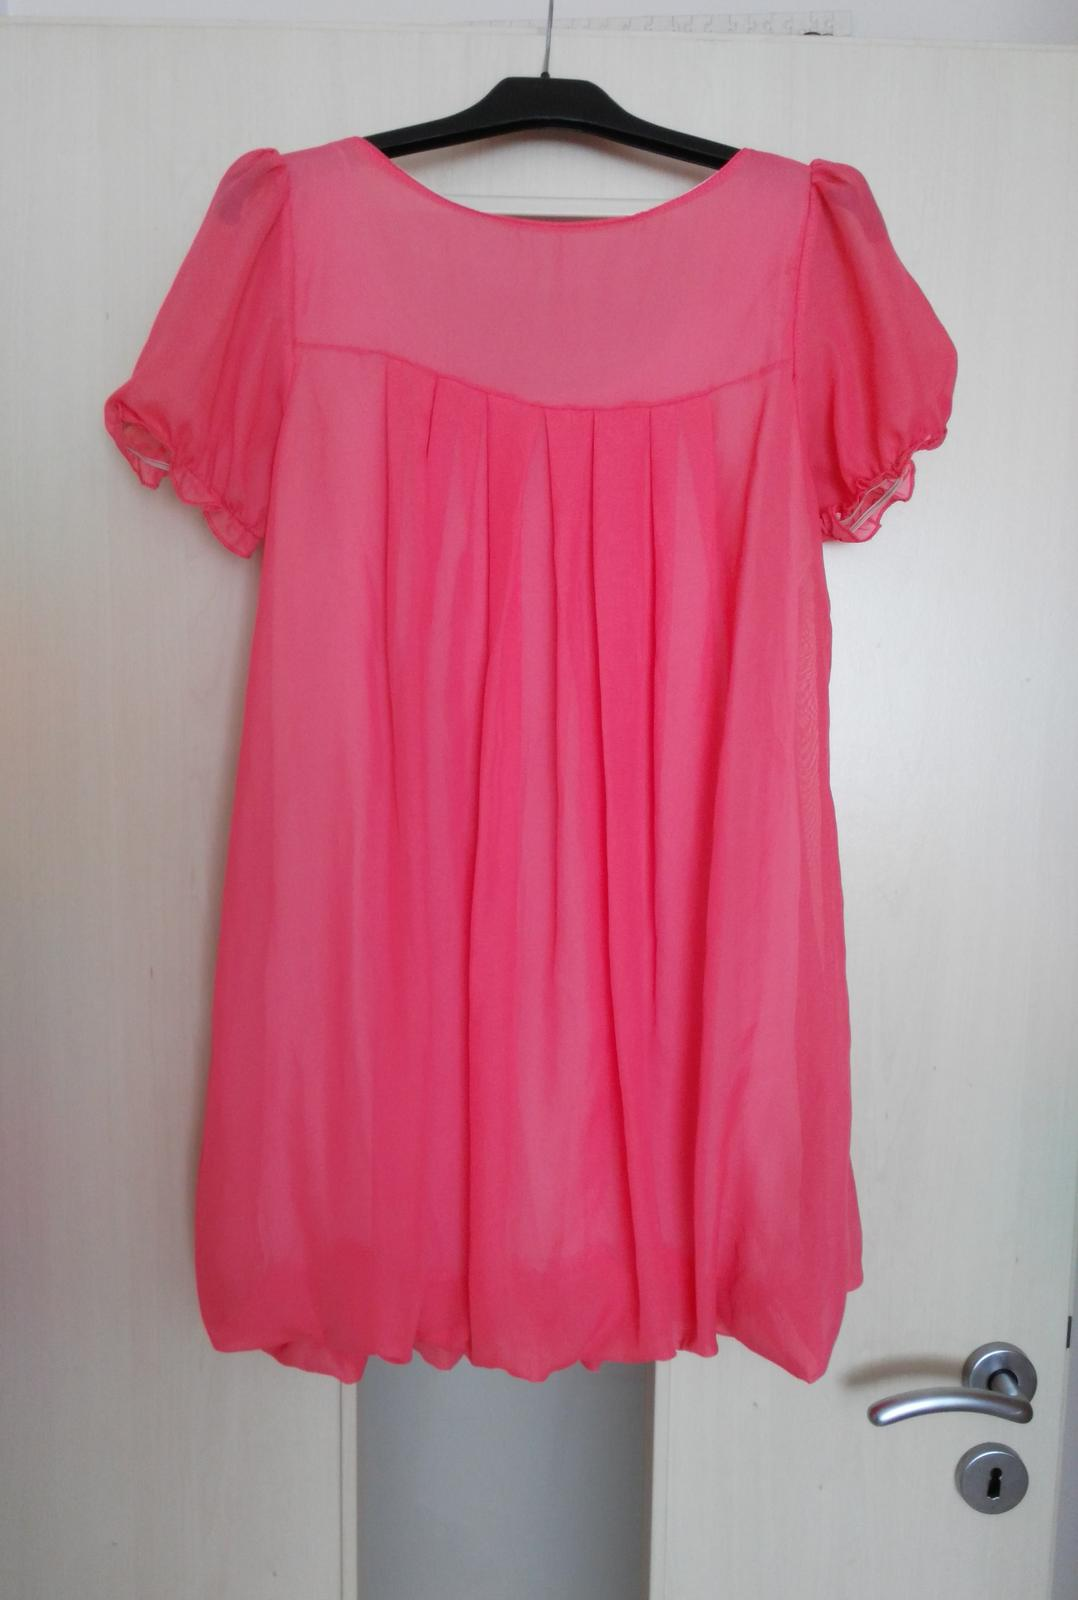 Lososové šifónové šaty 36-38 (S-M) - Obrázok č. 4